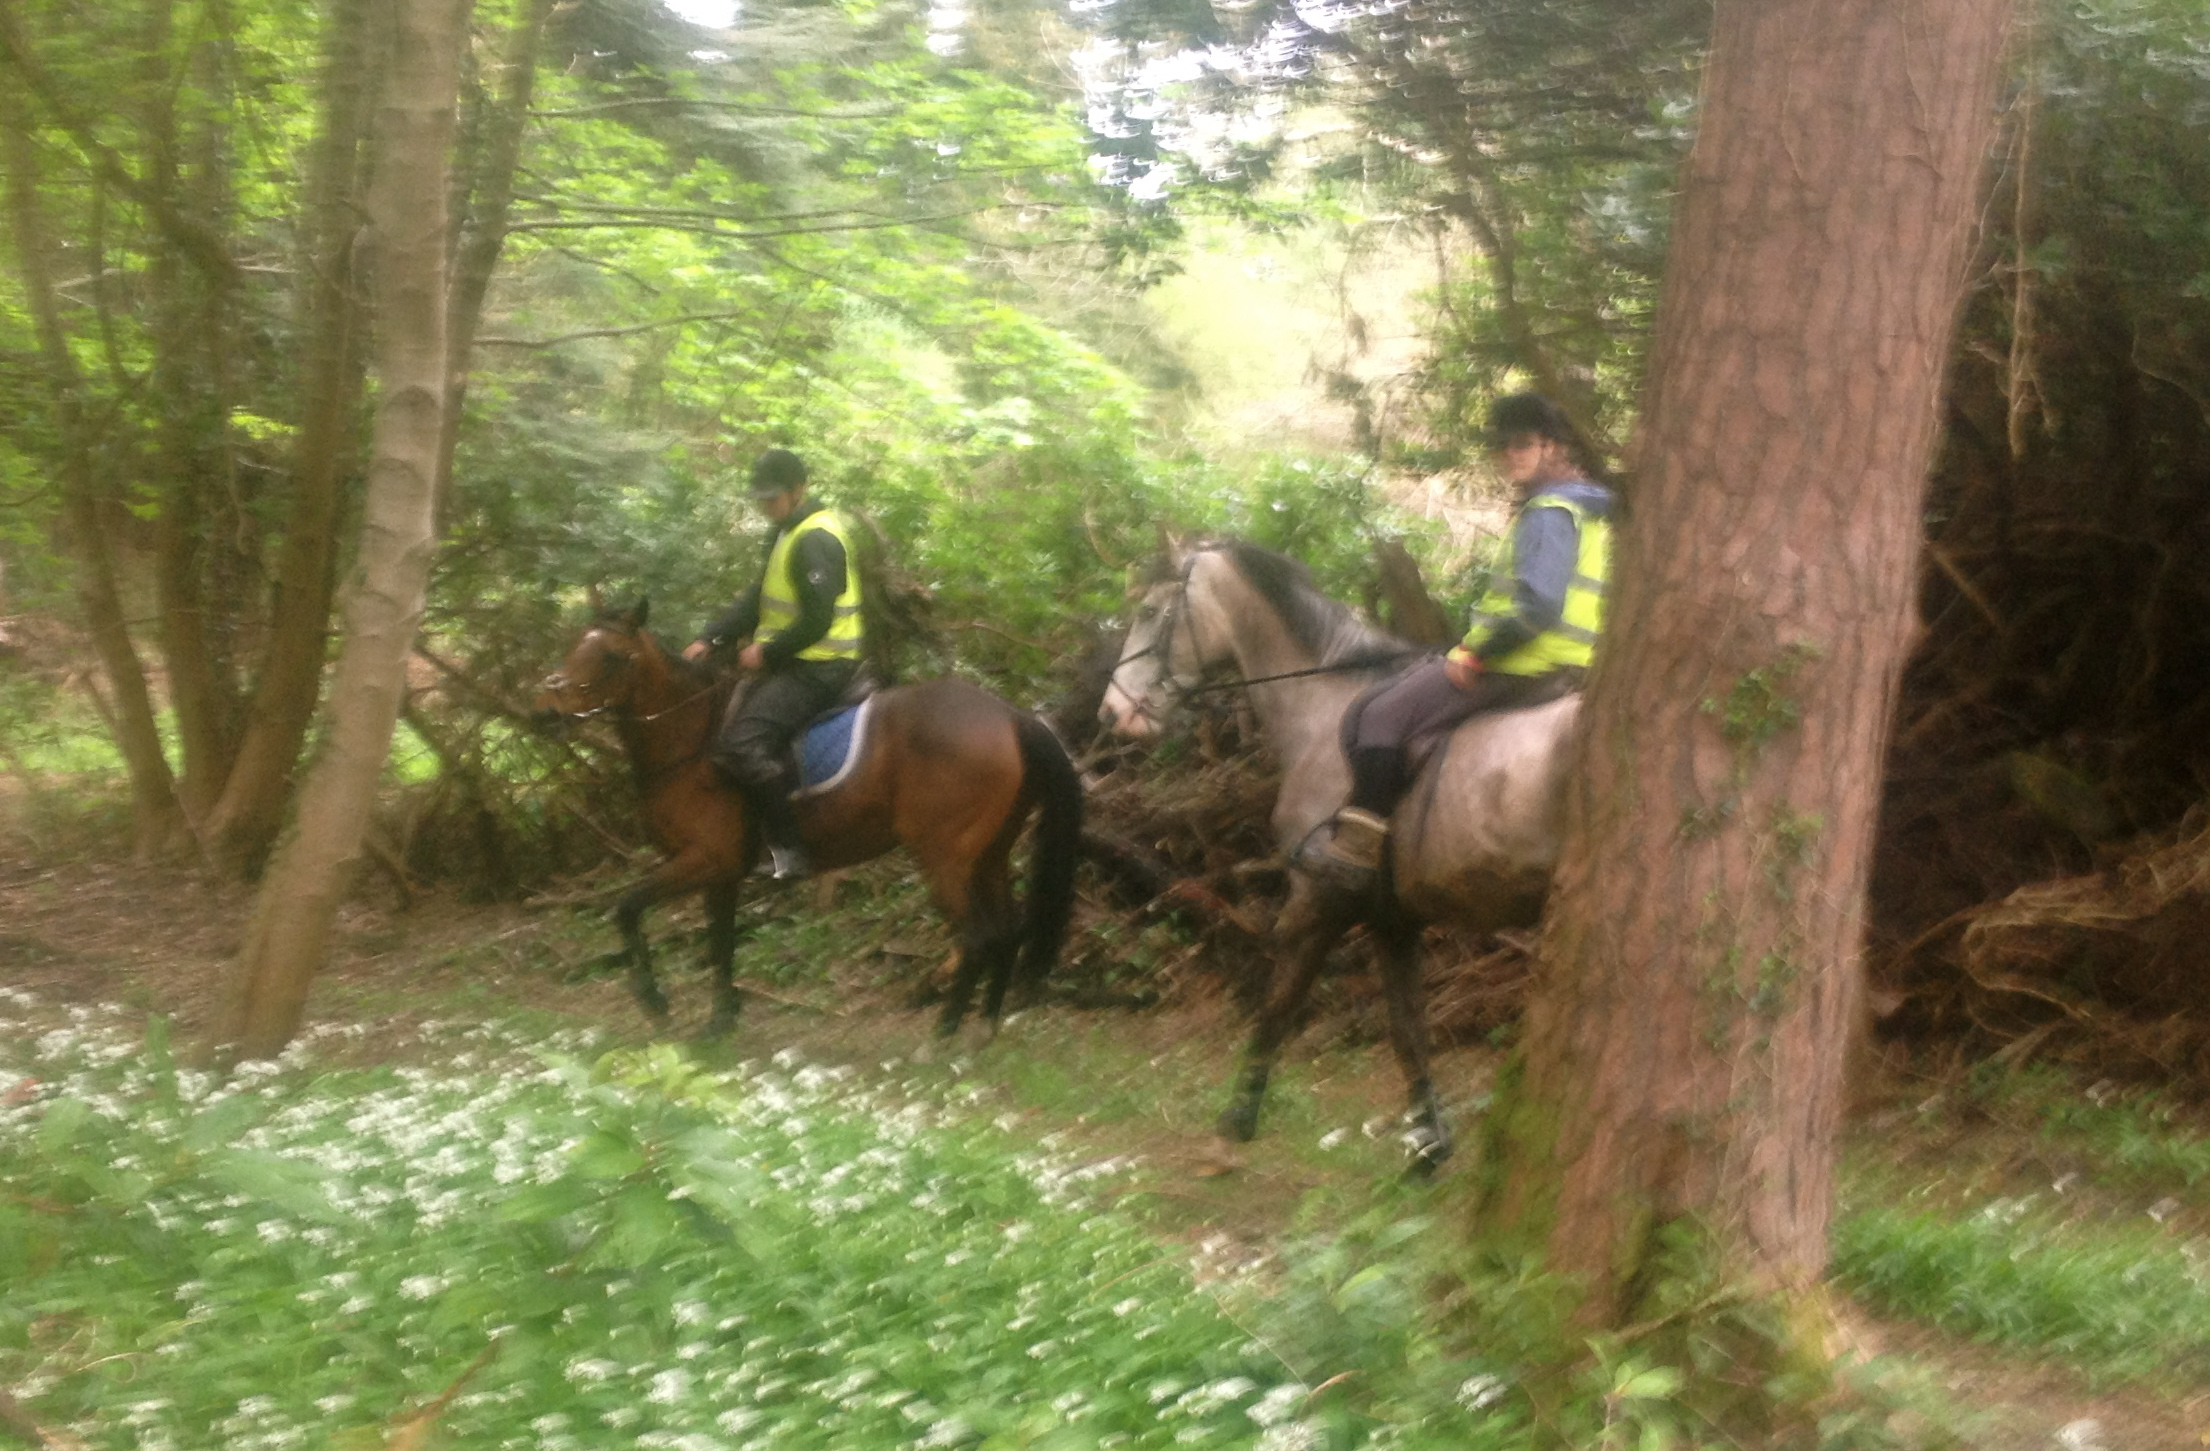 Horse Trekking Tours Wicklow